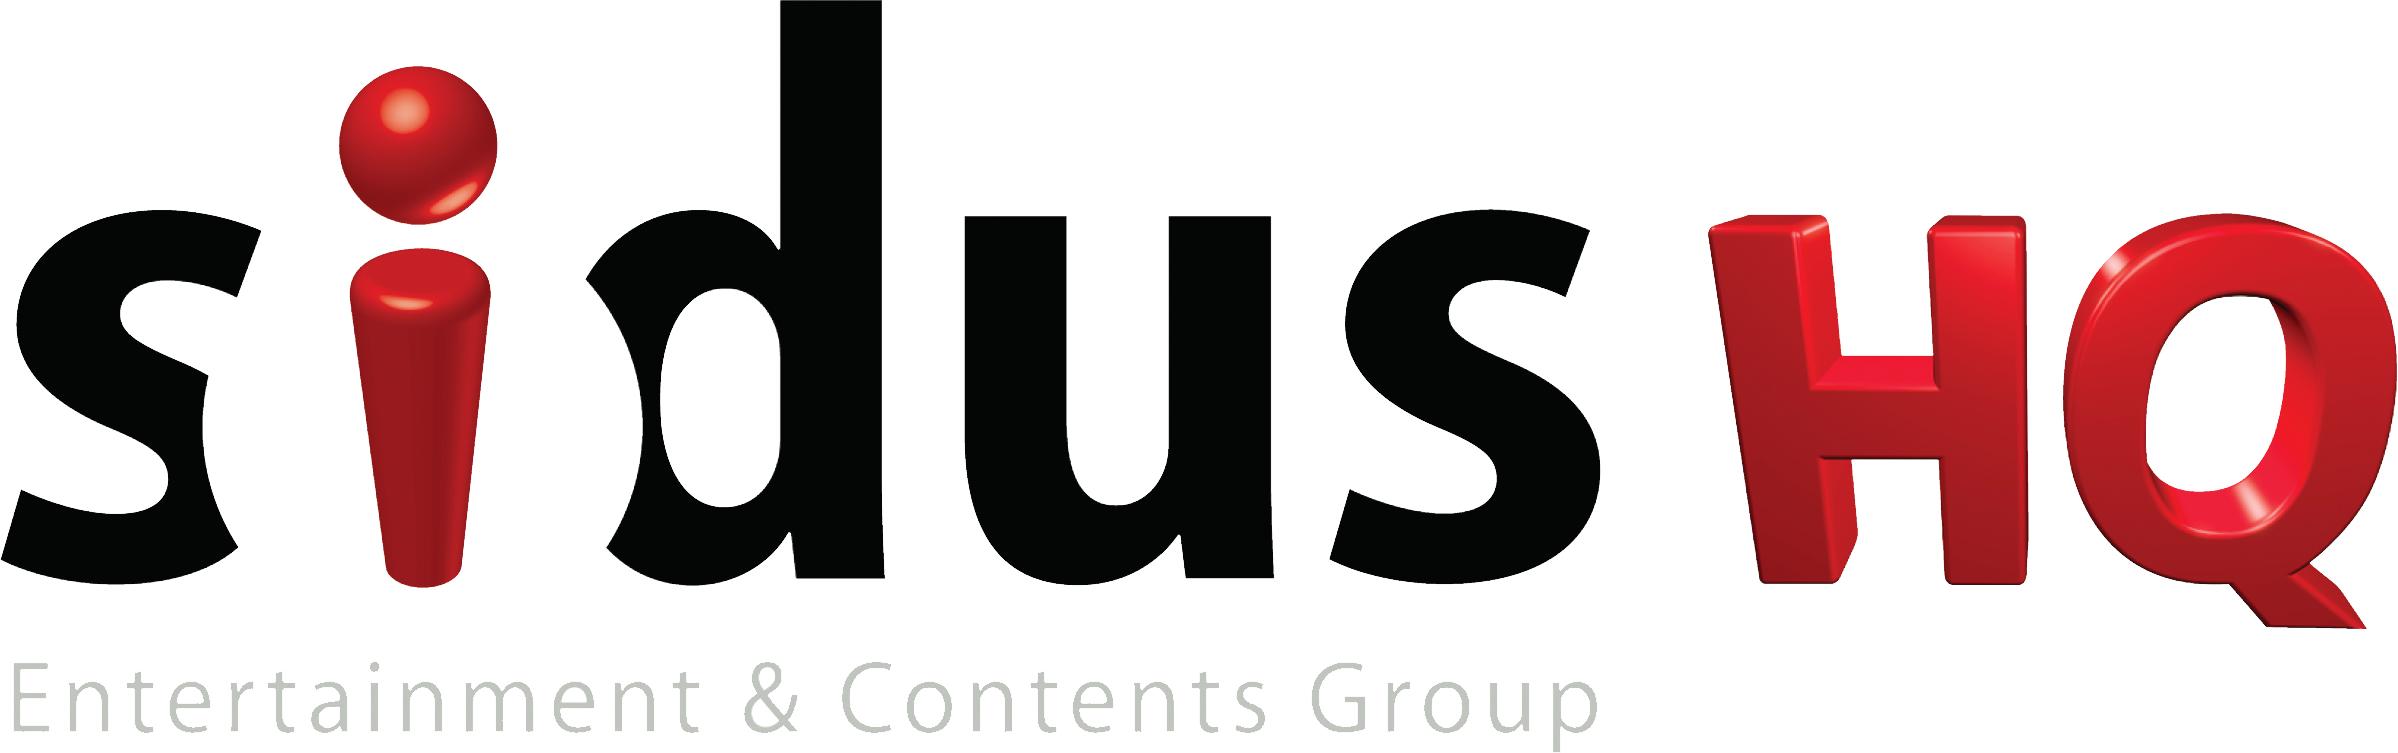 sidushq_logo.jpg